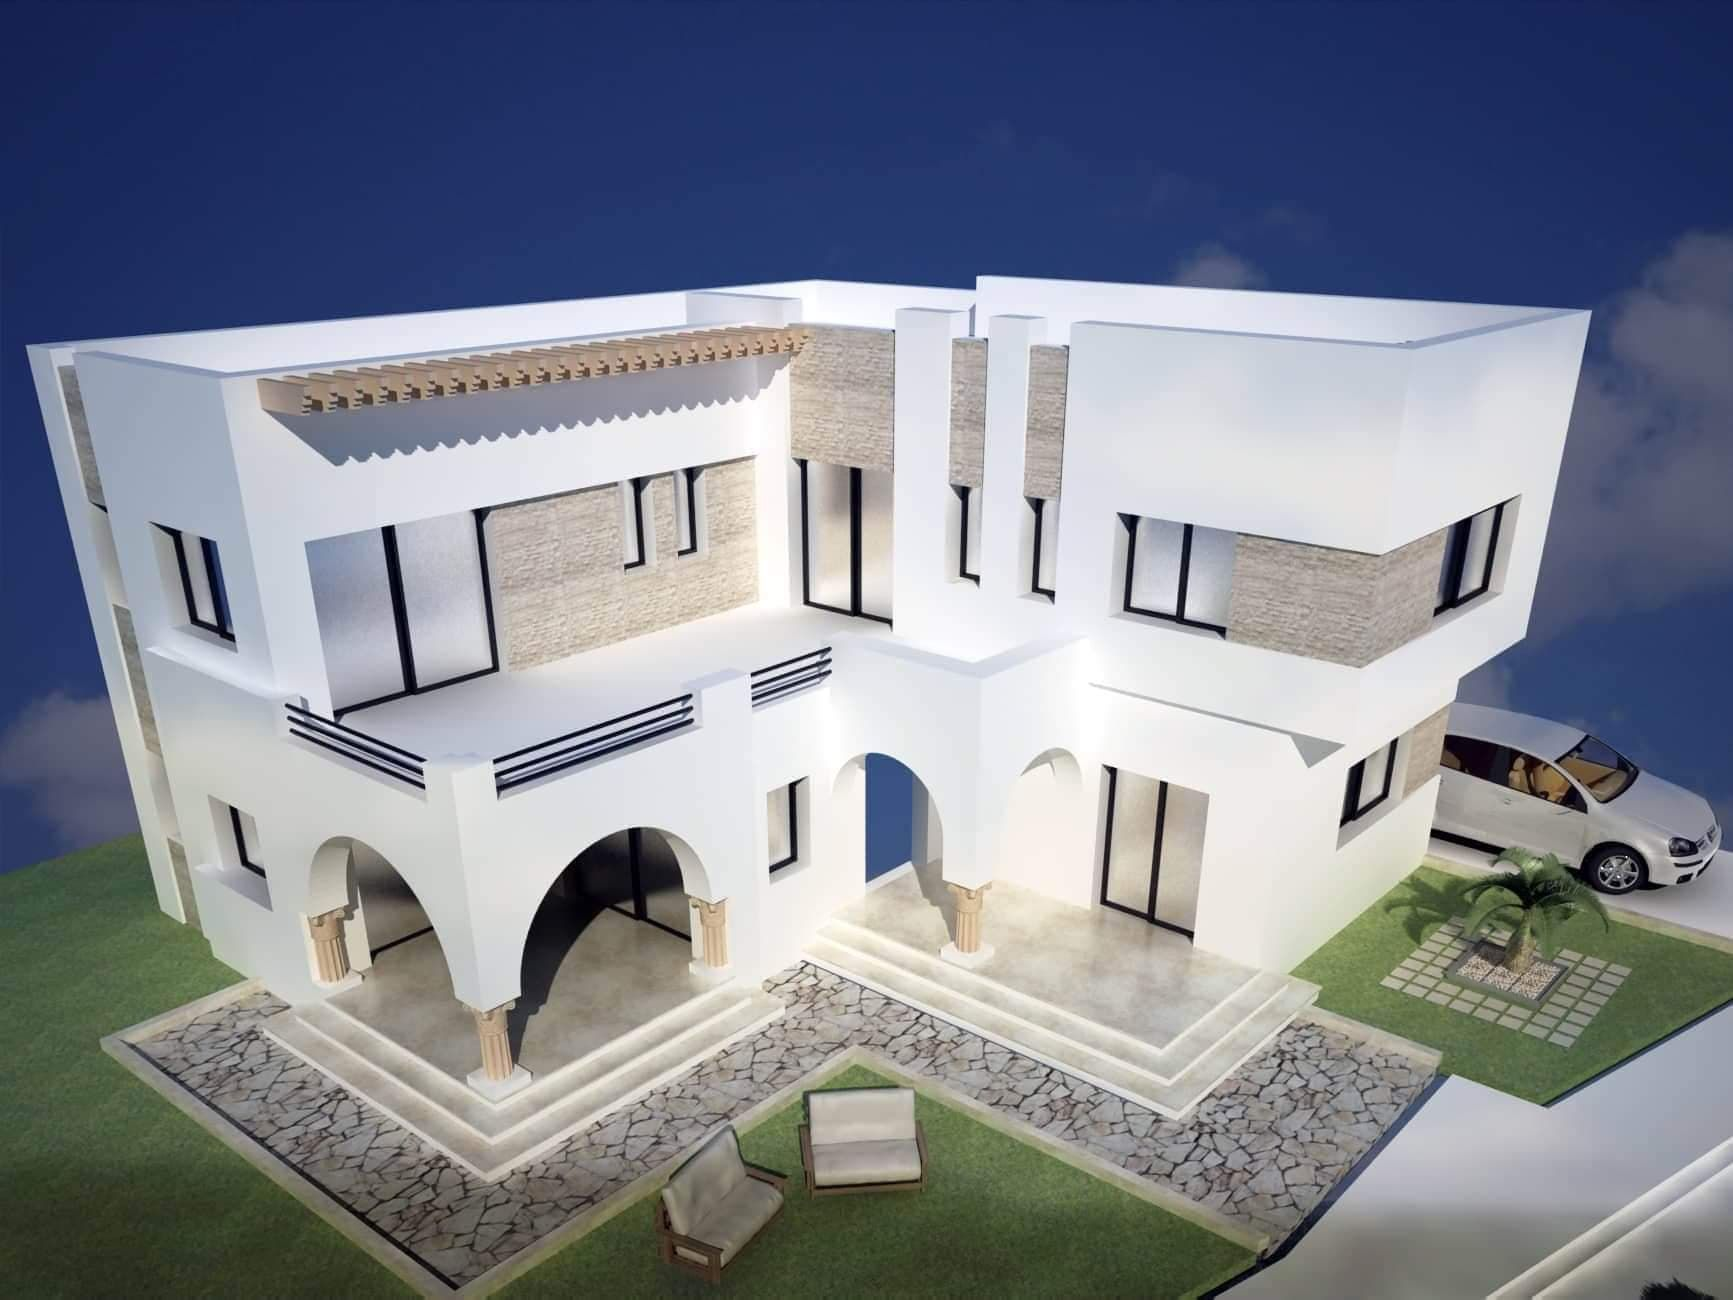 Villa brunella 1 réf:  hammamet opportunité